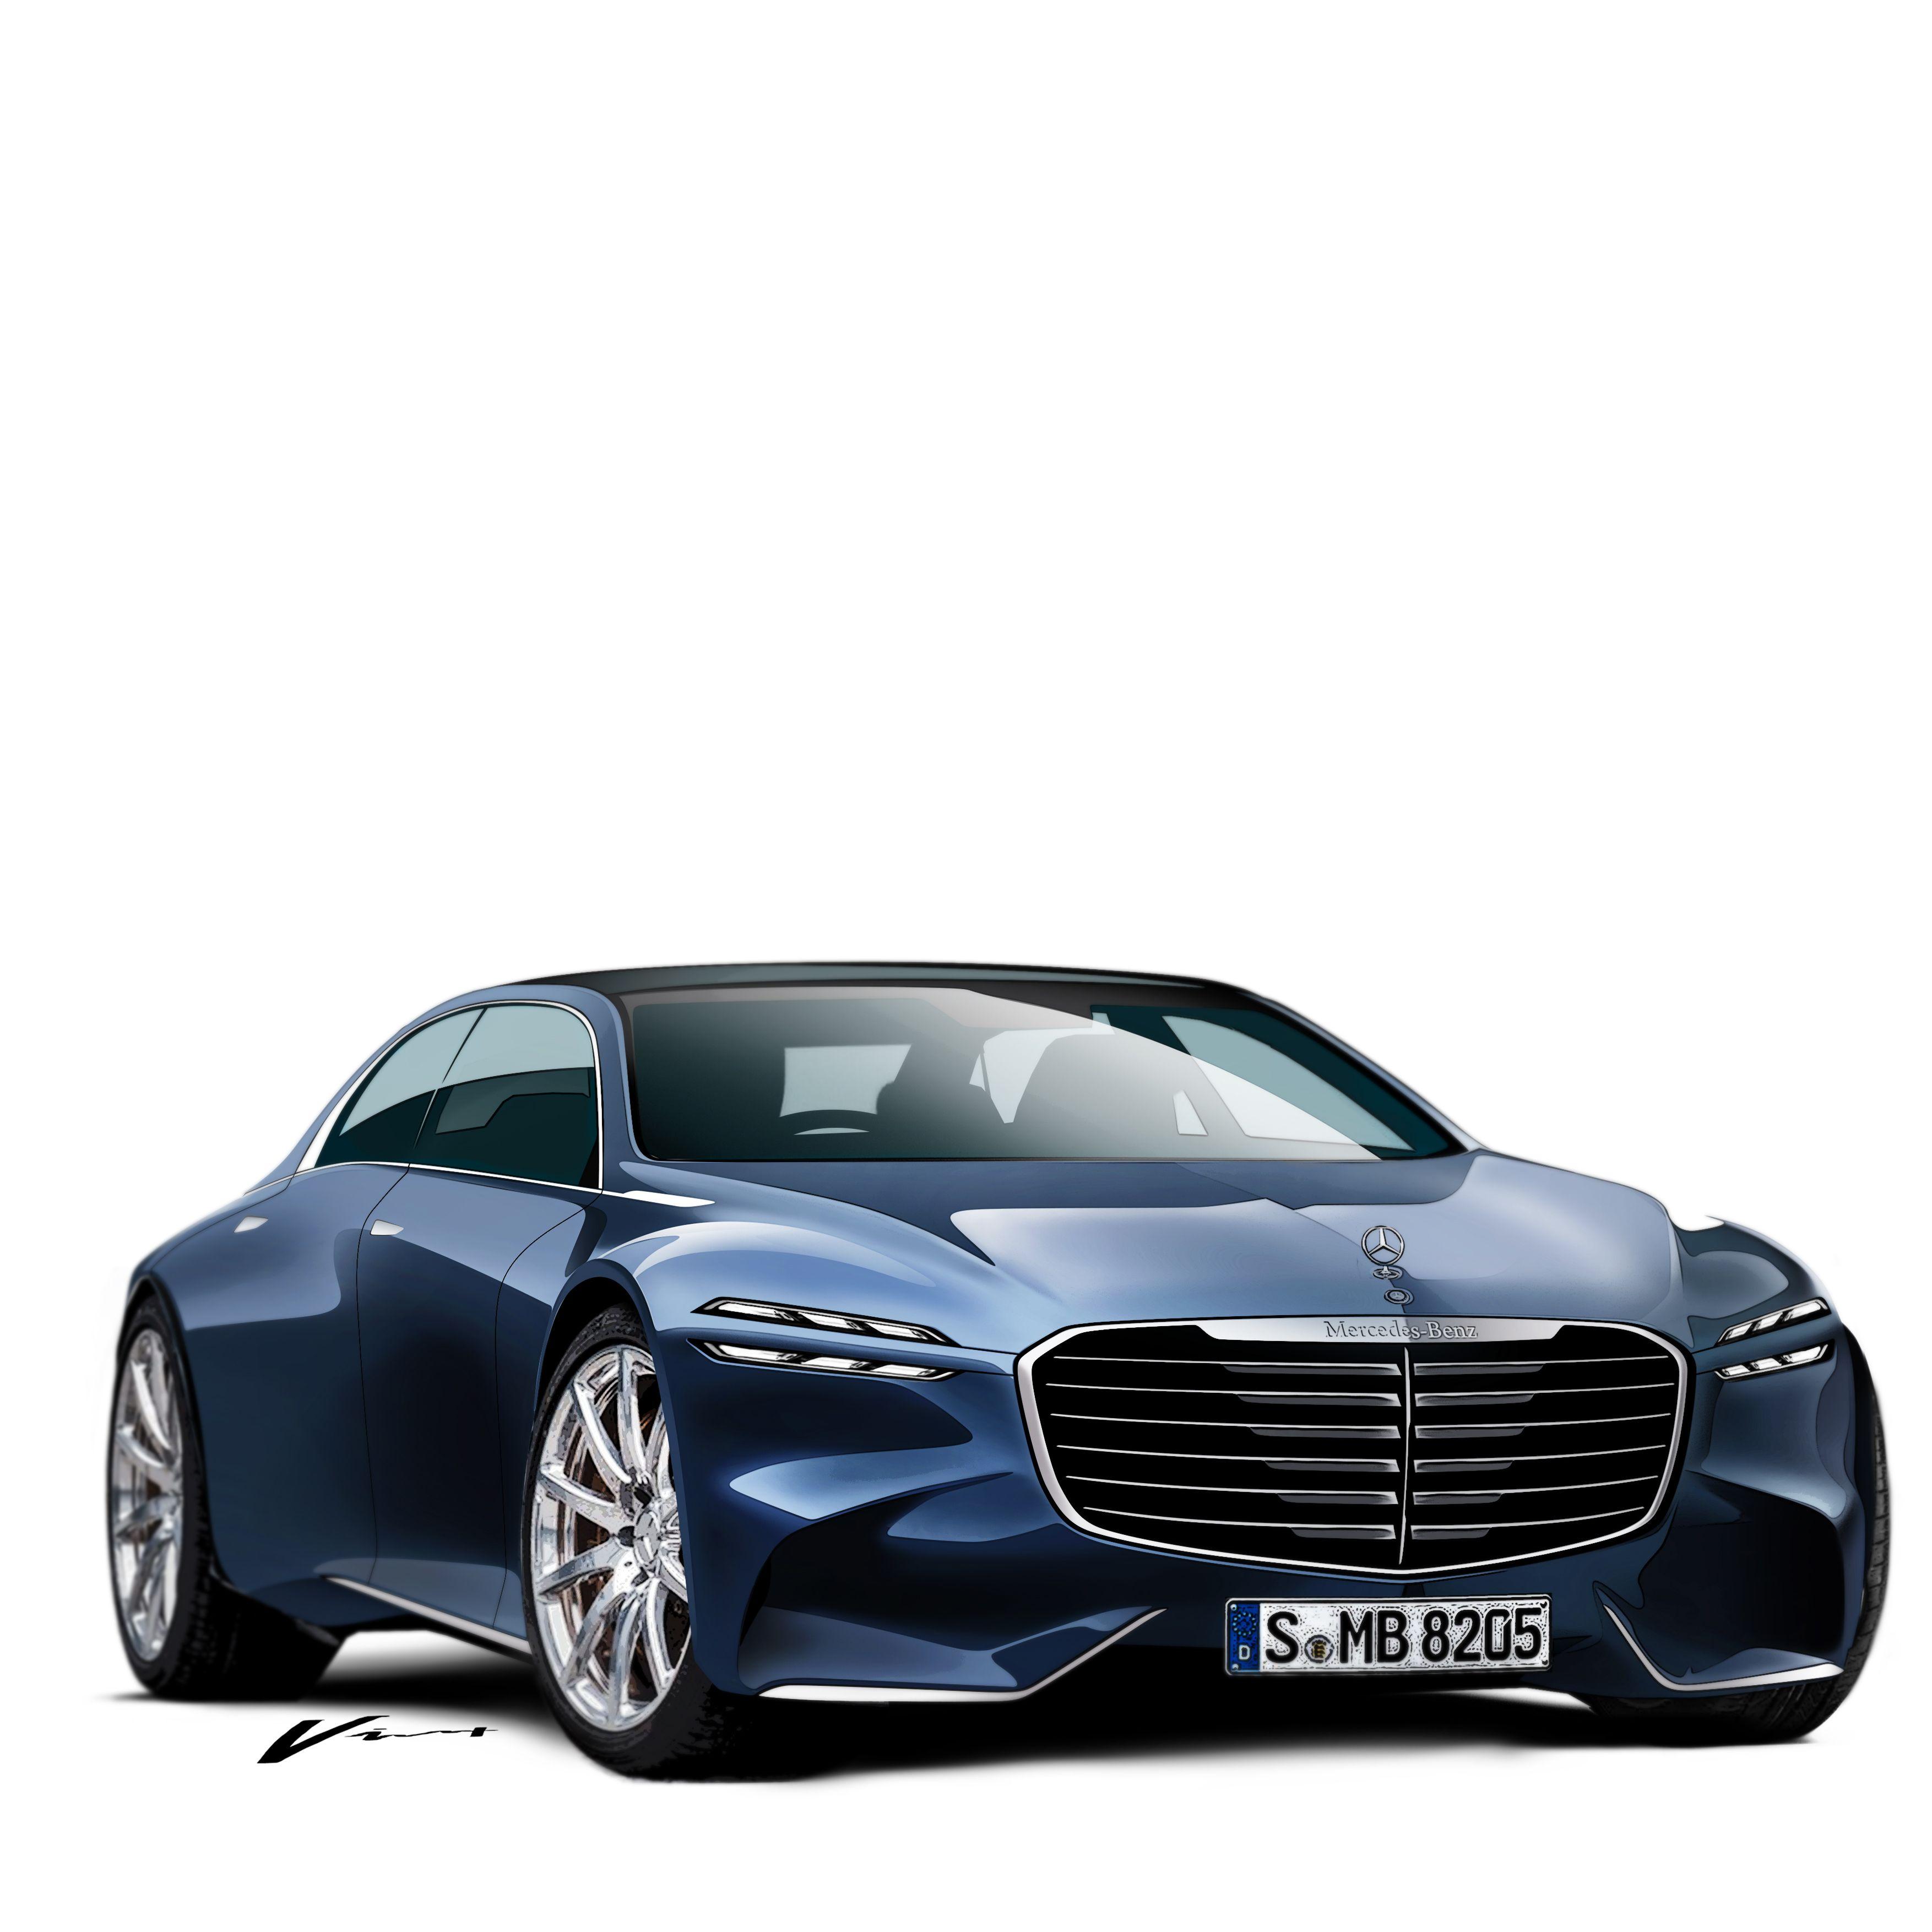 Mercedes Benz Luxury Sedan Hyundai Cars Futuristic Cars New Model Car